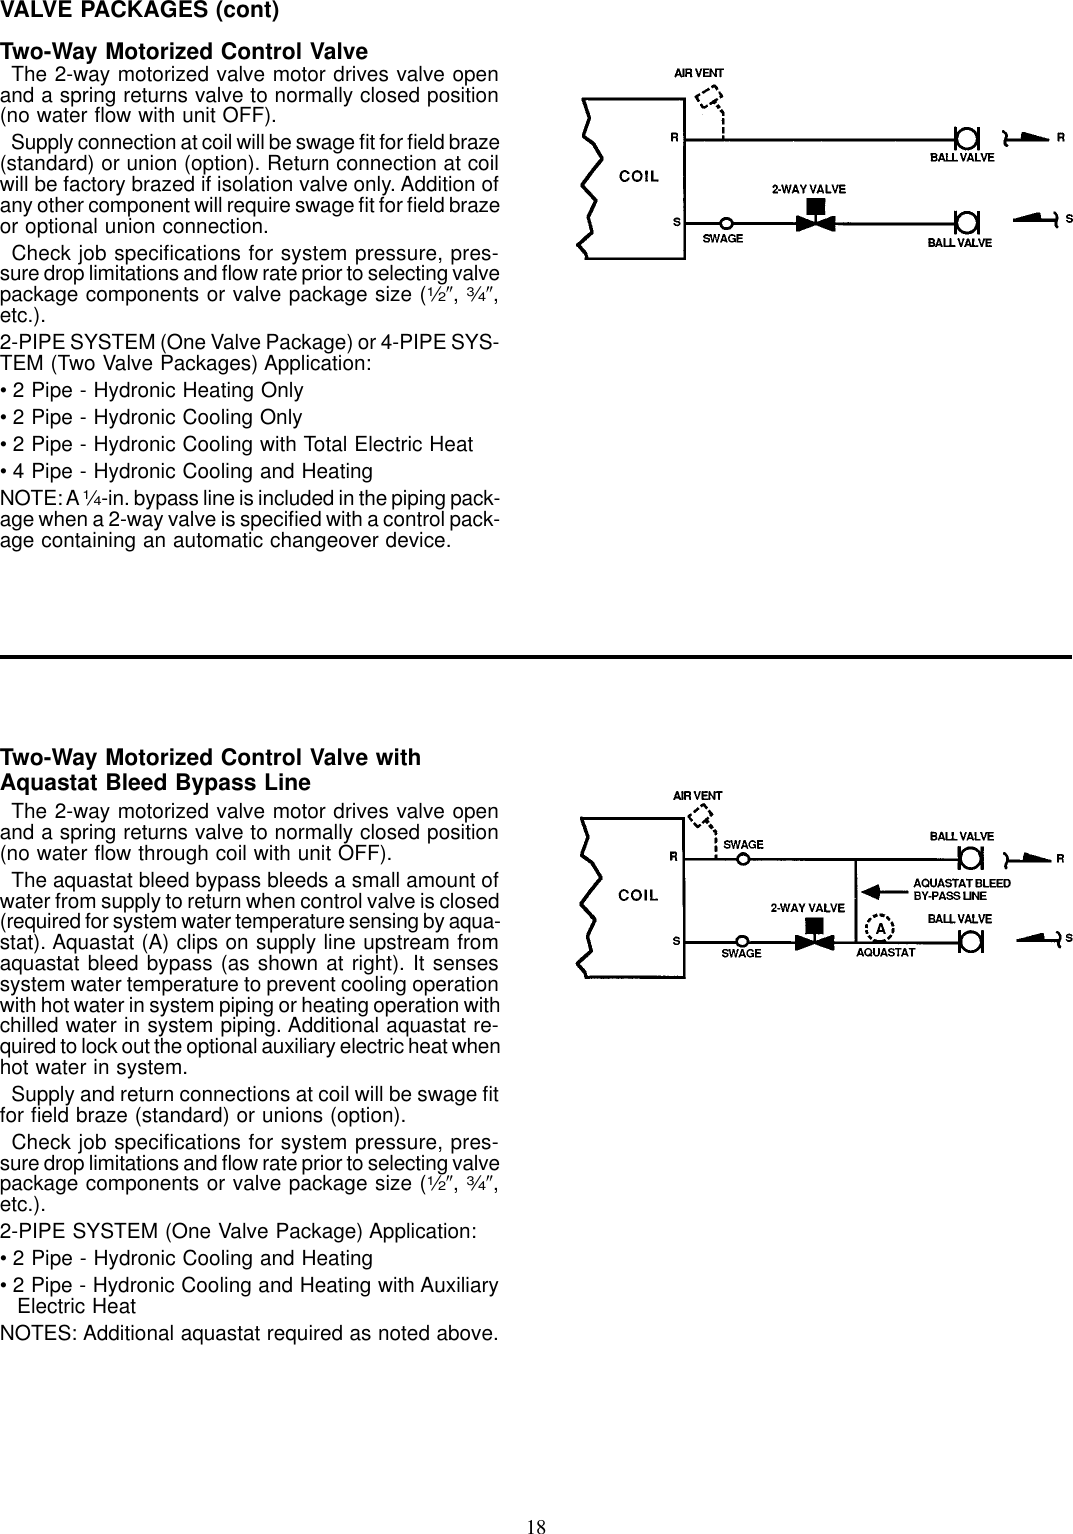 Electric Valvemotorized Ball Valveflow Control Valveelectric Valve